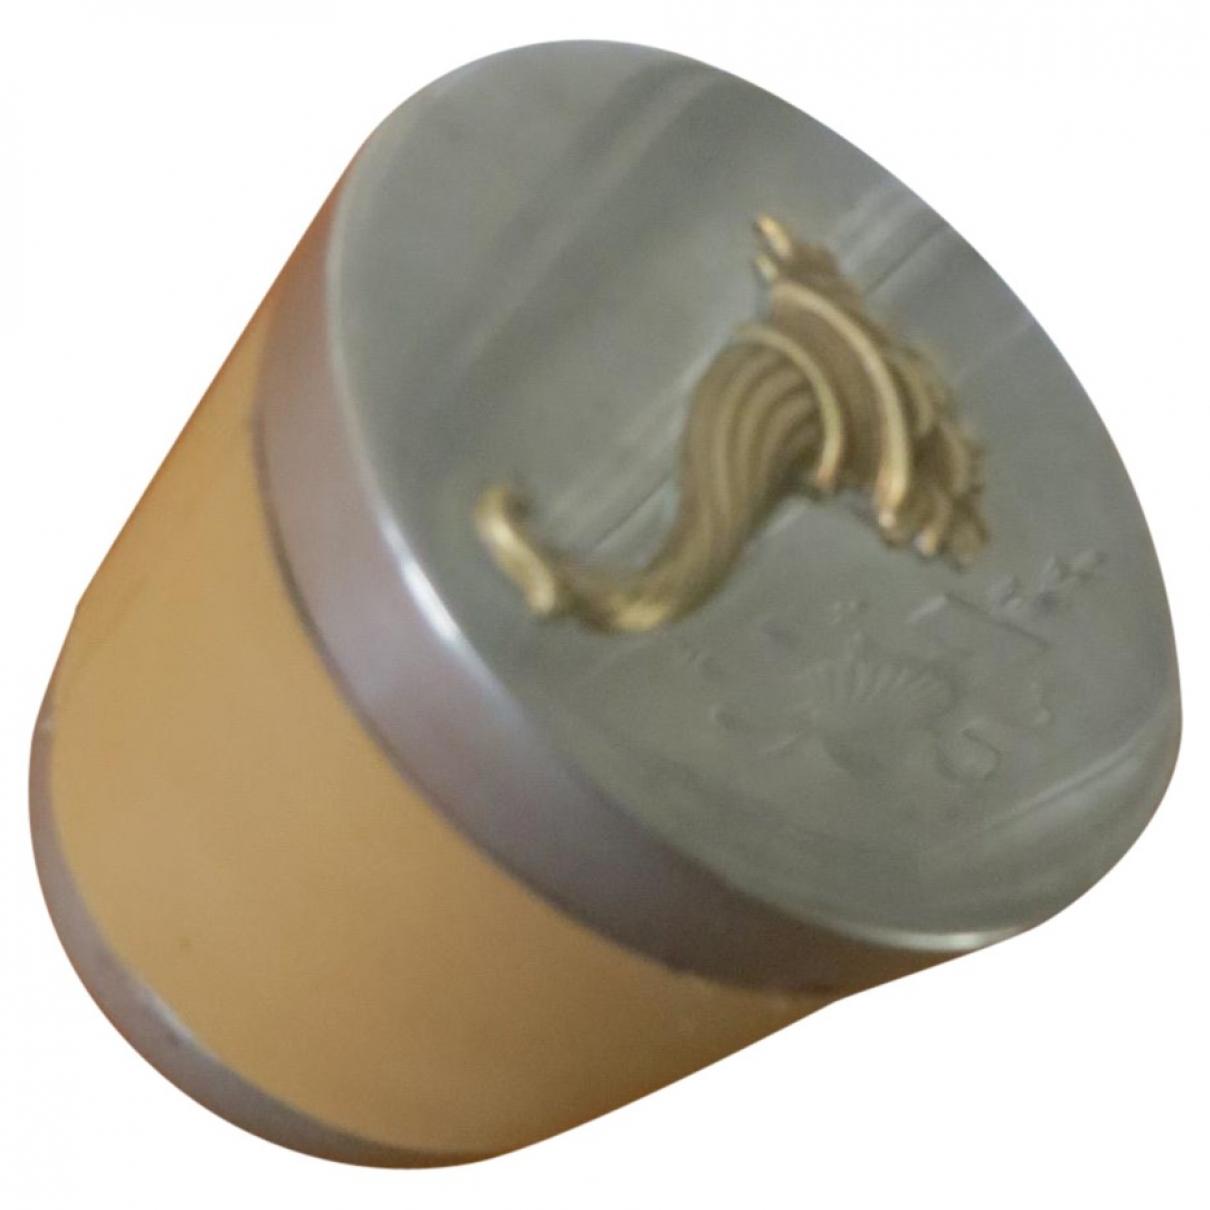 Hermes \N Accessoires und Dekoration in  Silber Metall